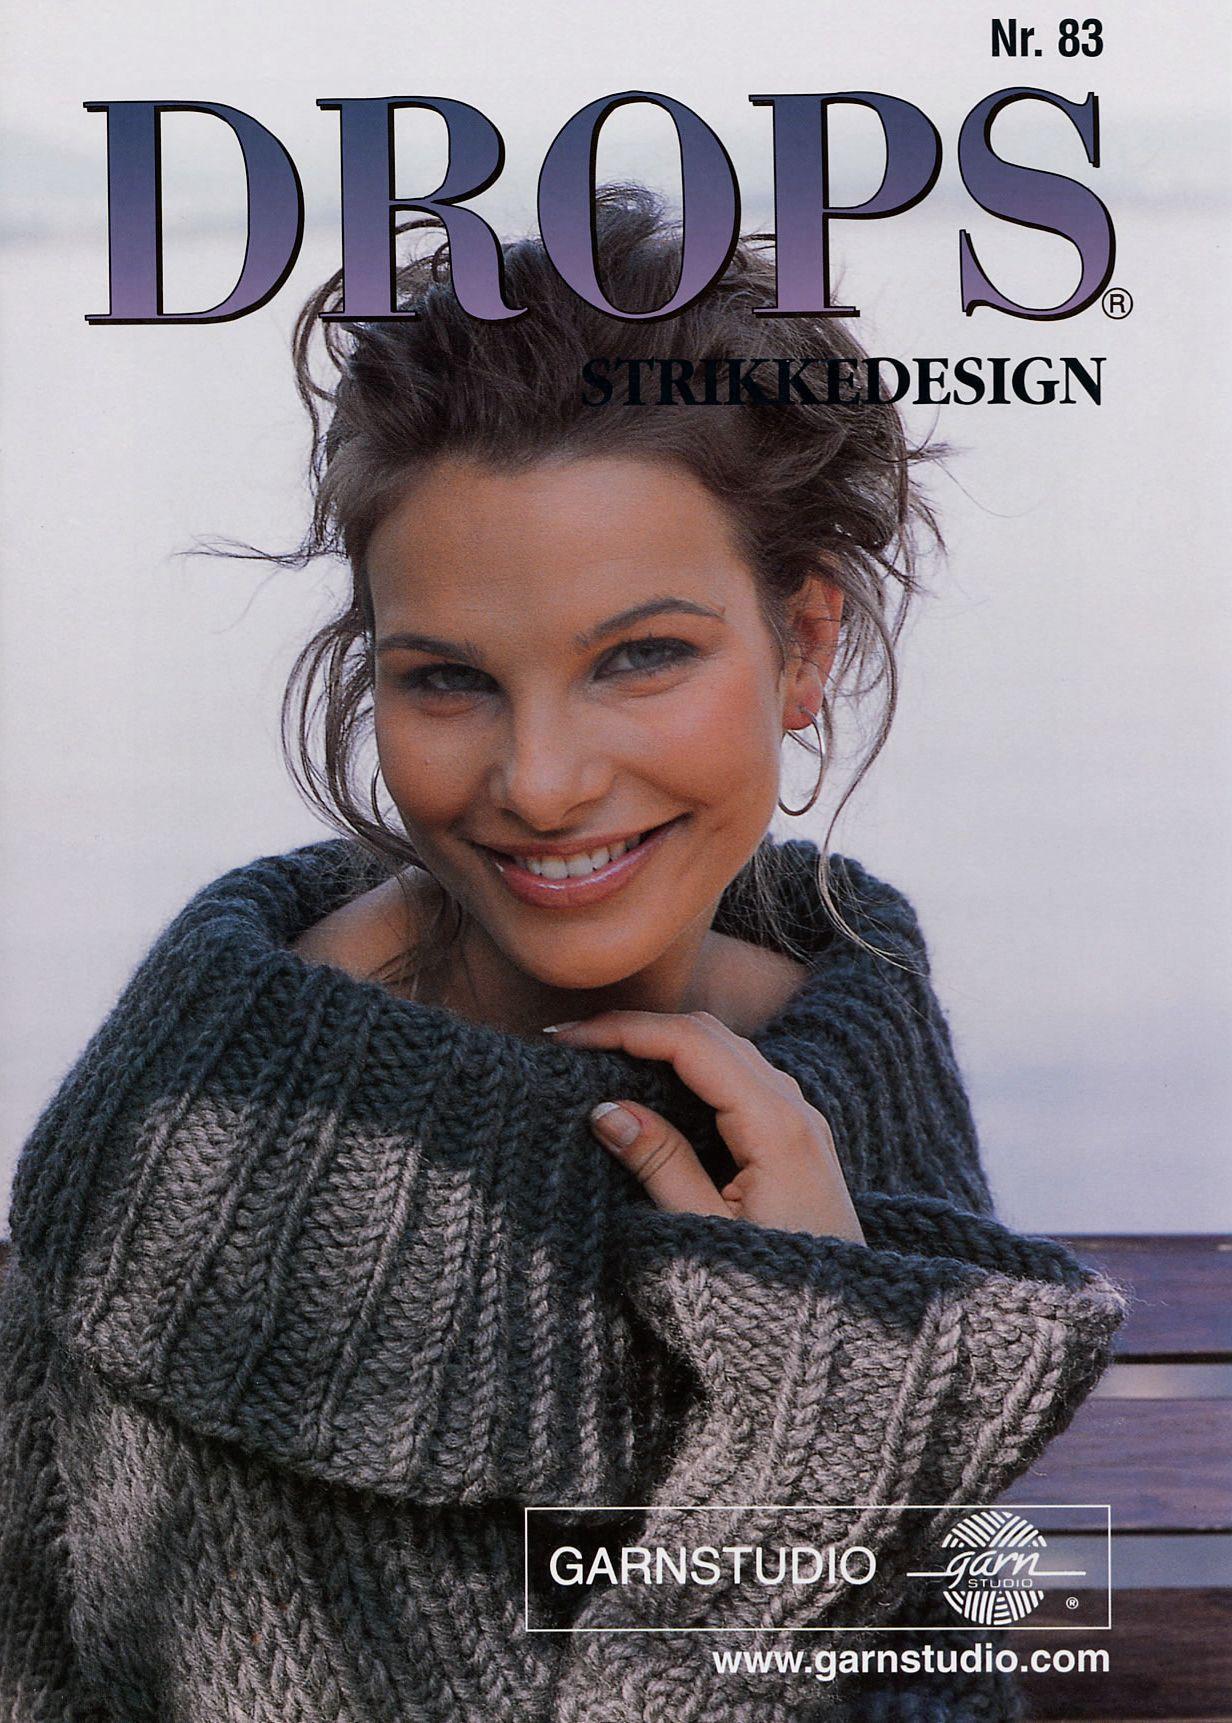 DROPS No. 83 | Hook projects | Pinterest | Drop, Crochet magazine ...